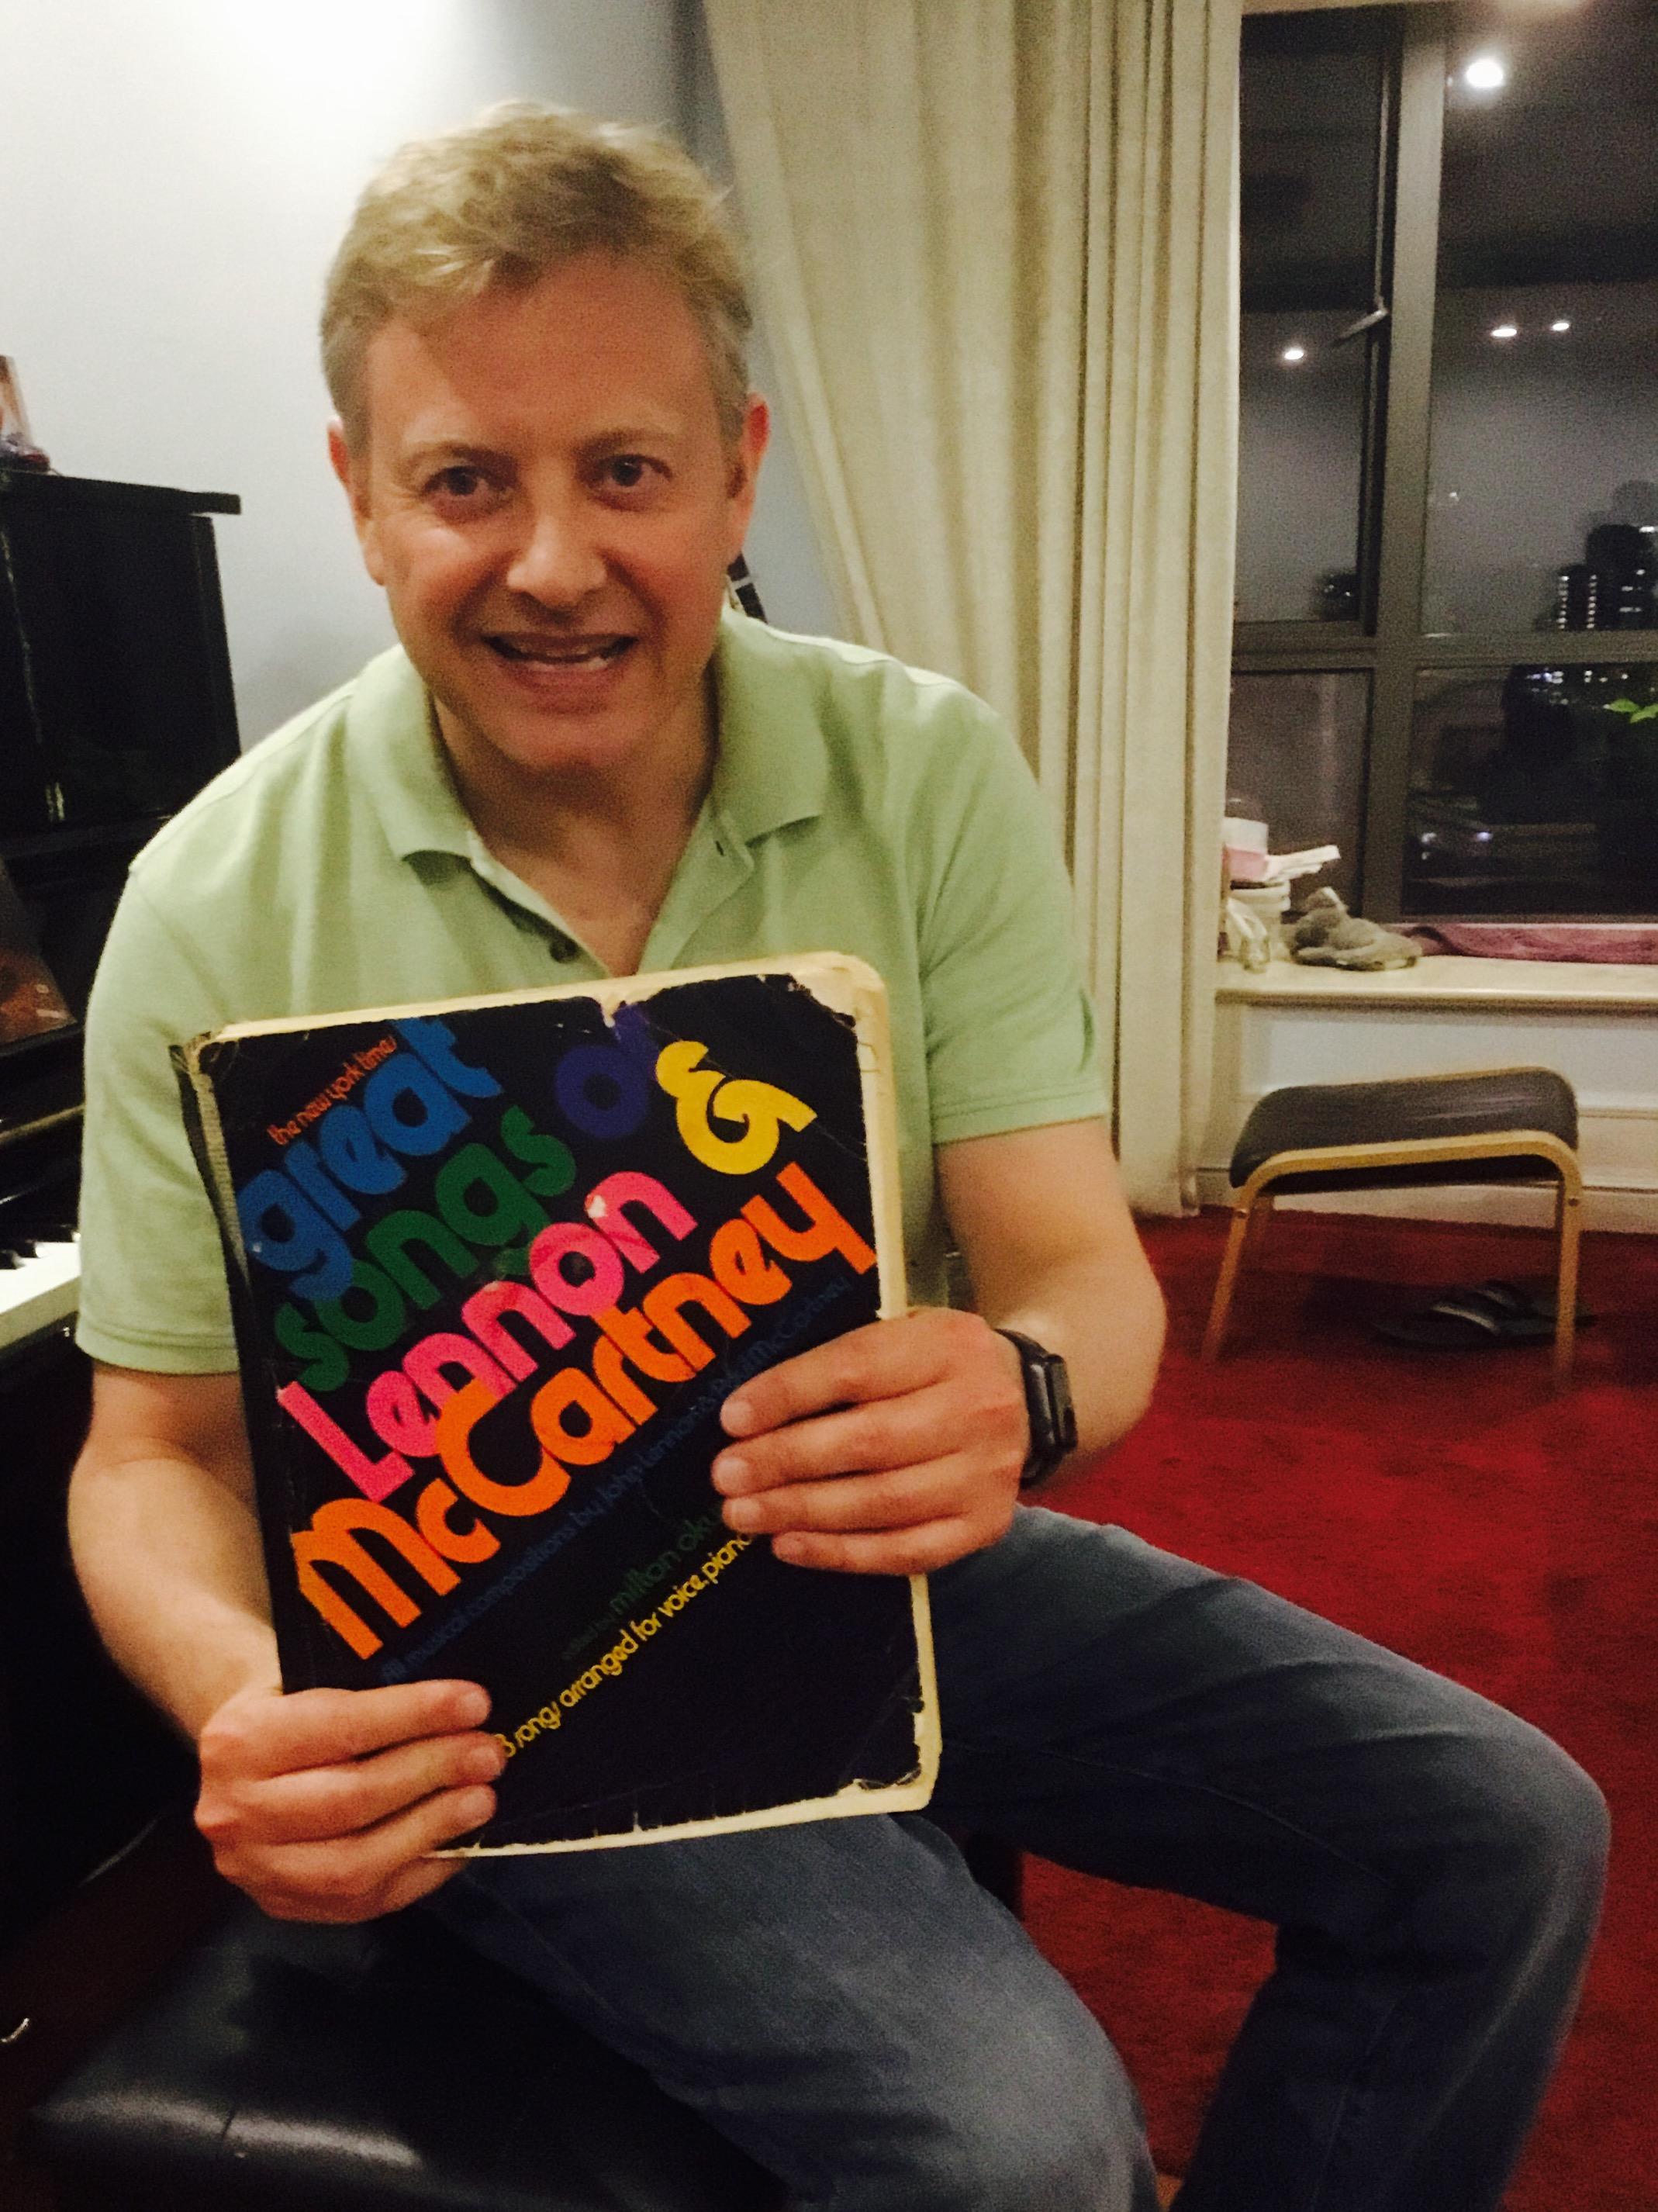 My bible: the Songs of Lennon & McCartney